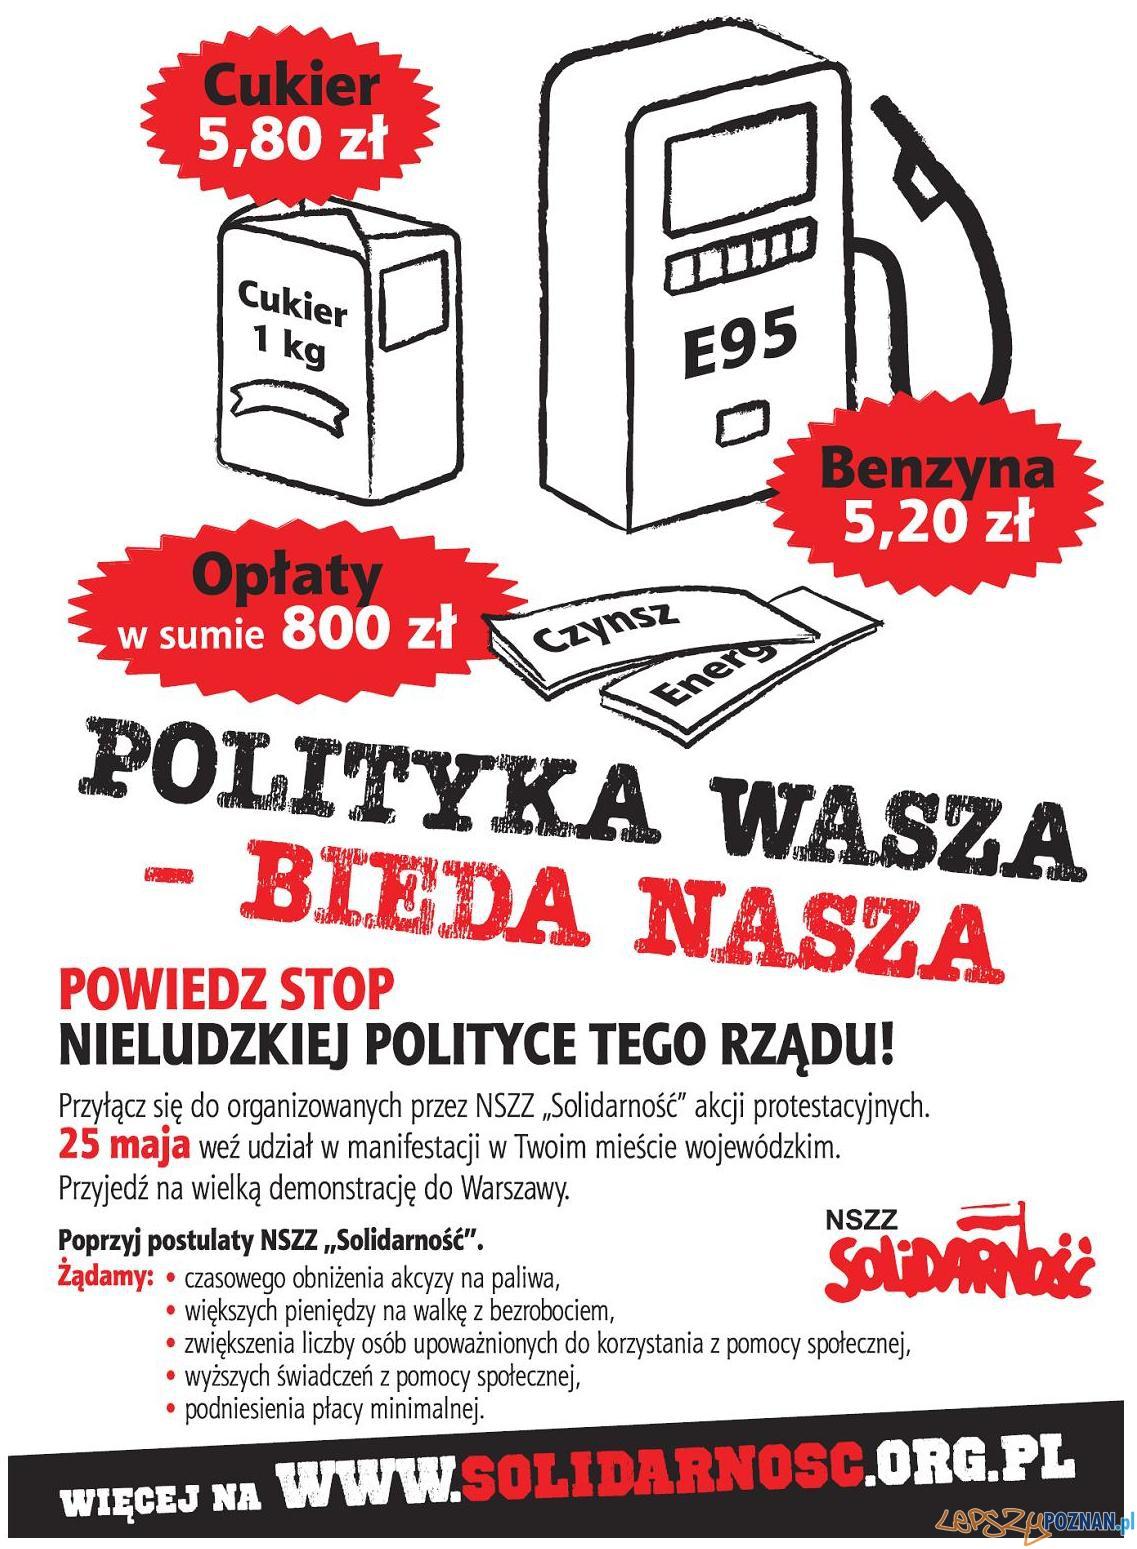 solidarnosc_plakat 25 05 2011  Foto: nszz solidarność